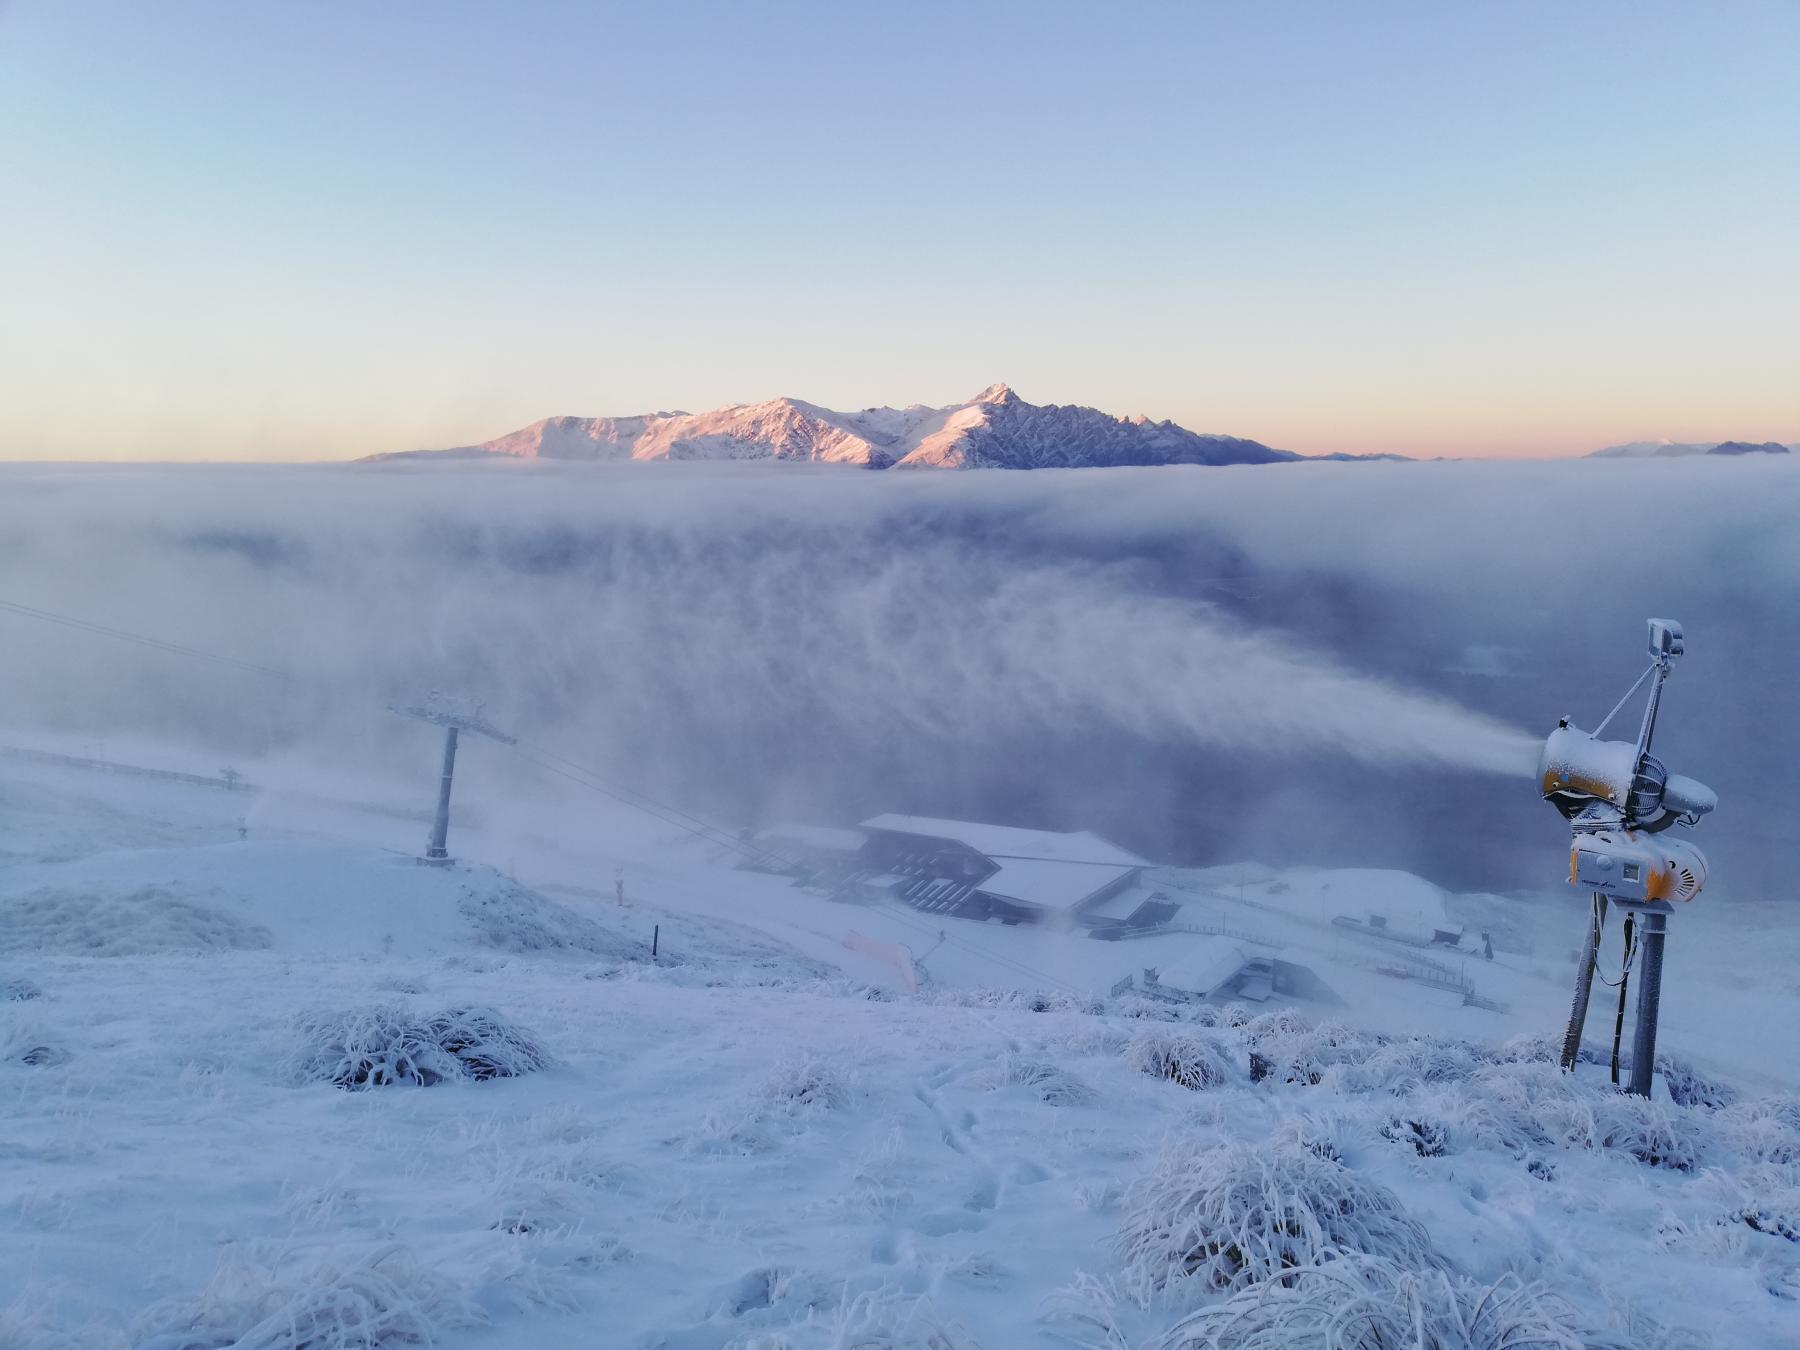 First snow Coronet Peak by Paul Jones